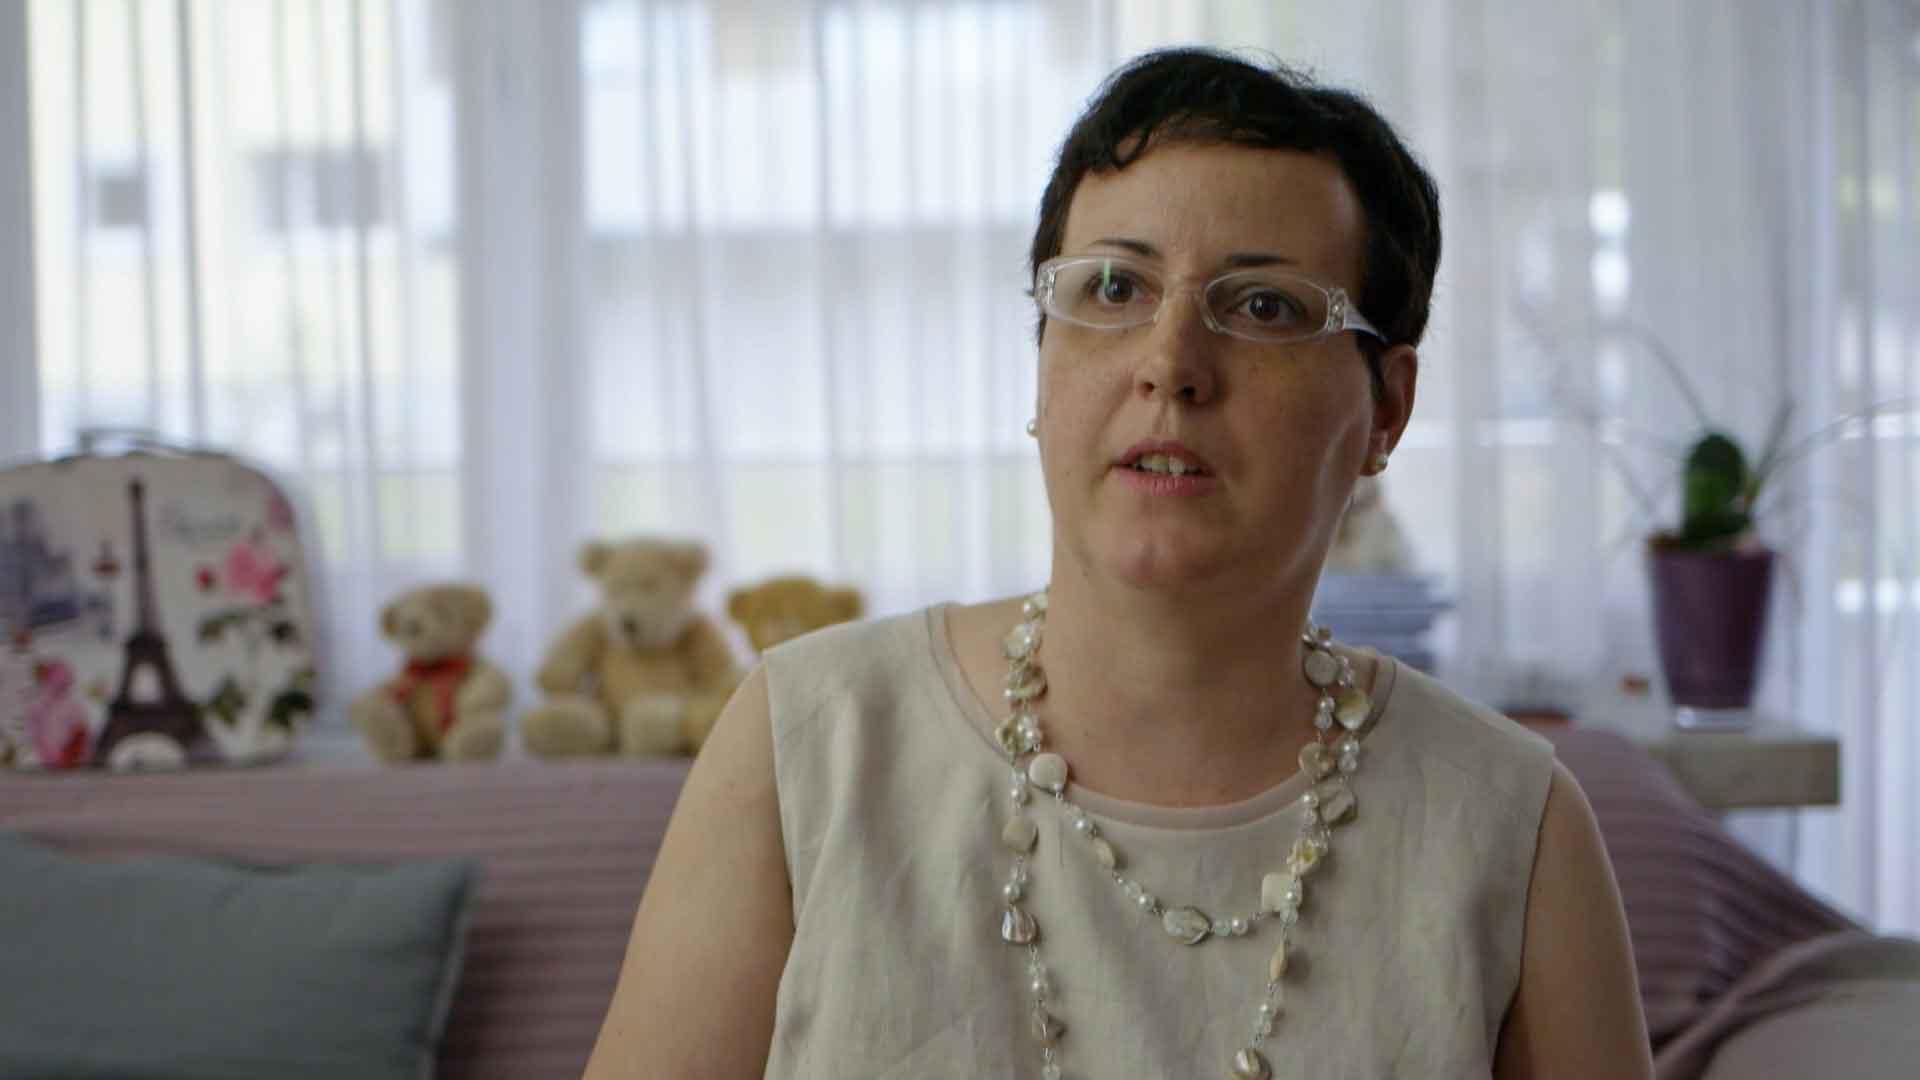 Kathrin Mueller